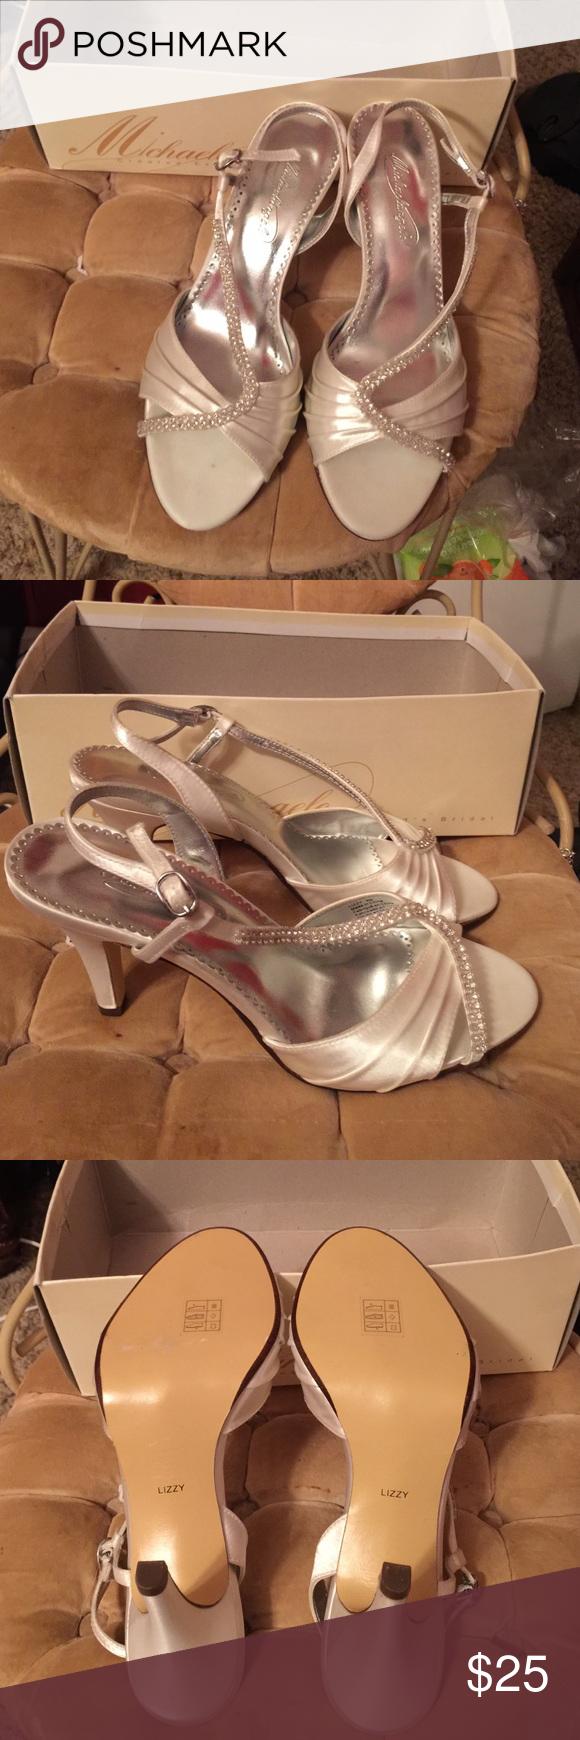 Beautiful New Michaelangelo Wedding Shoes Boutique